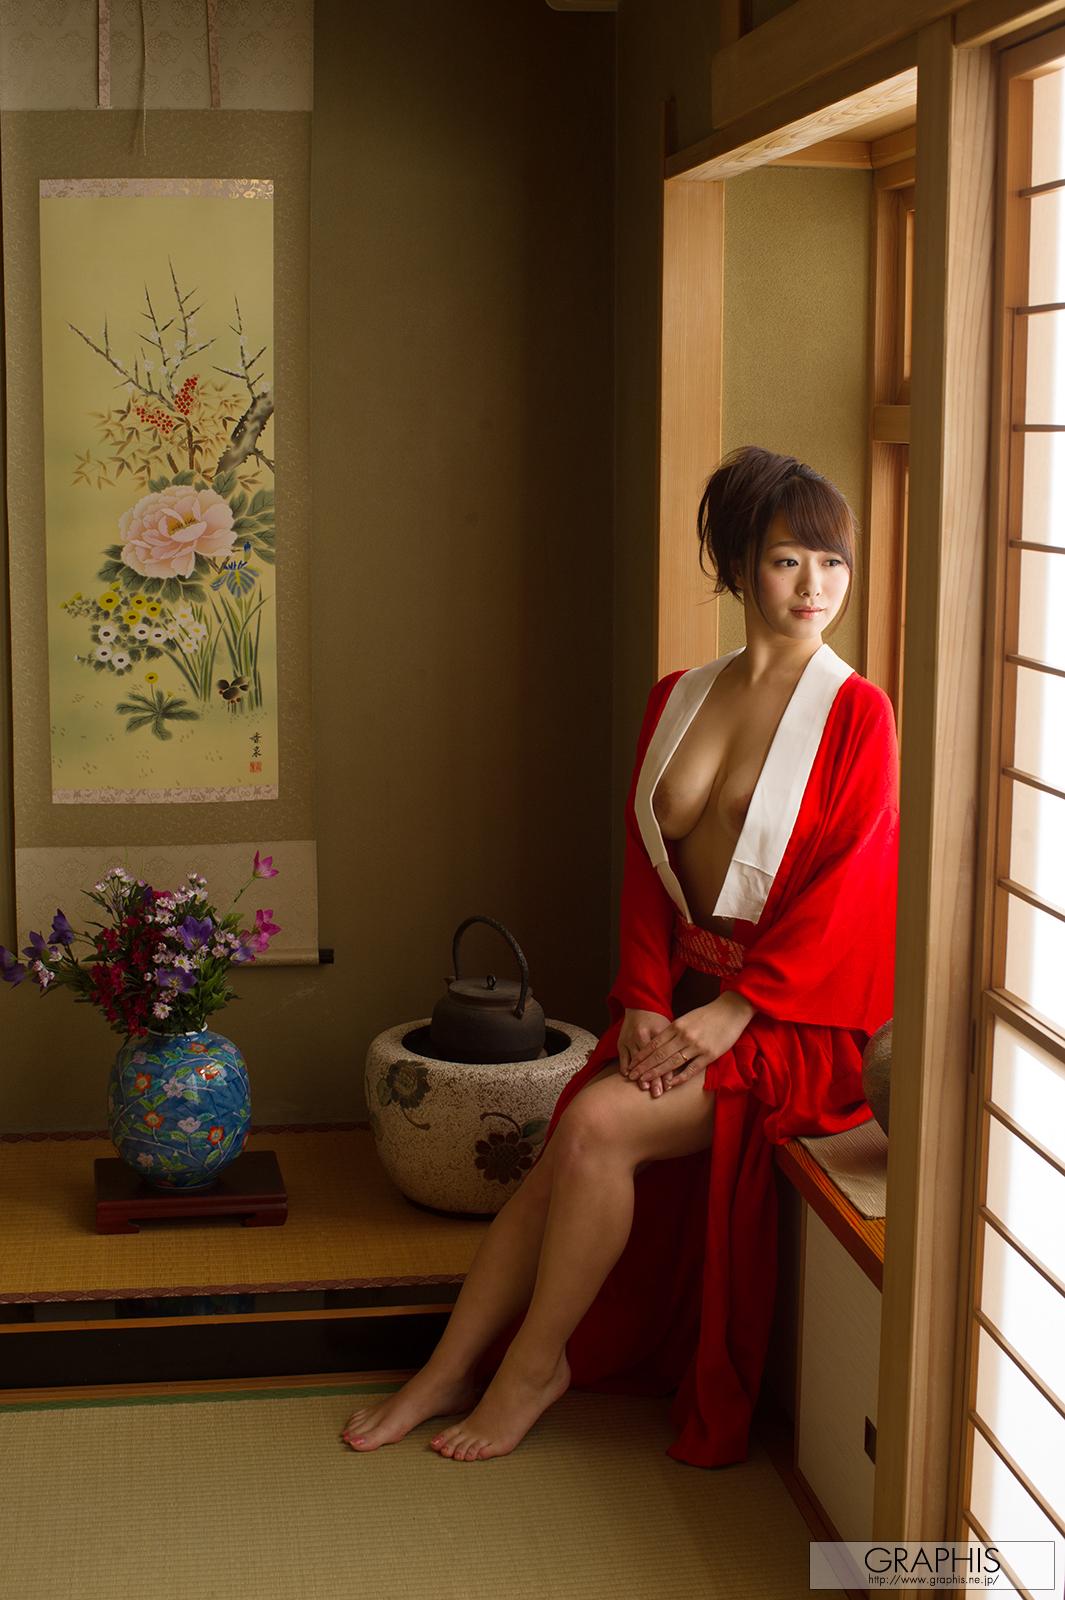 marina-shiraishi-red-kimono-boobs-naked-asian-graphis-07